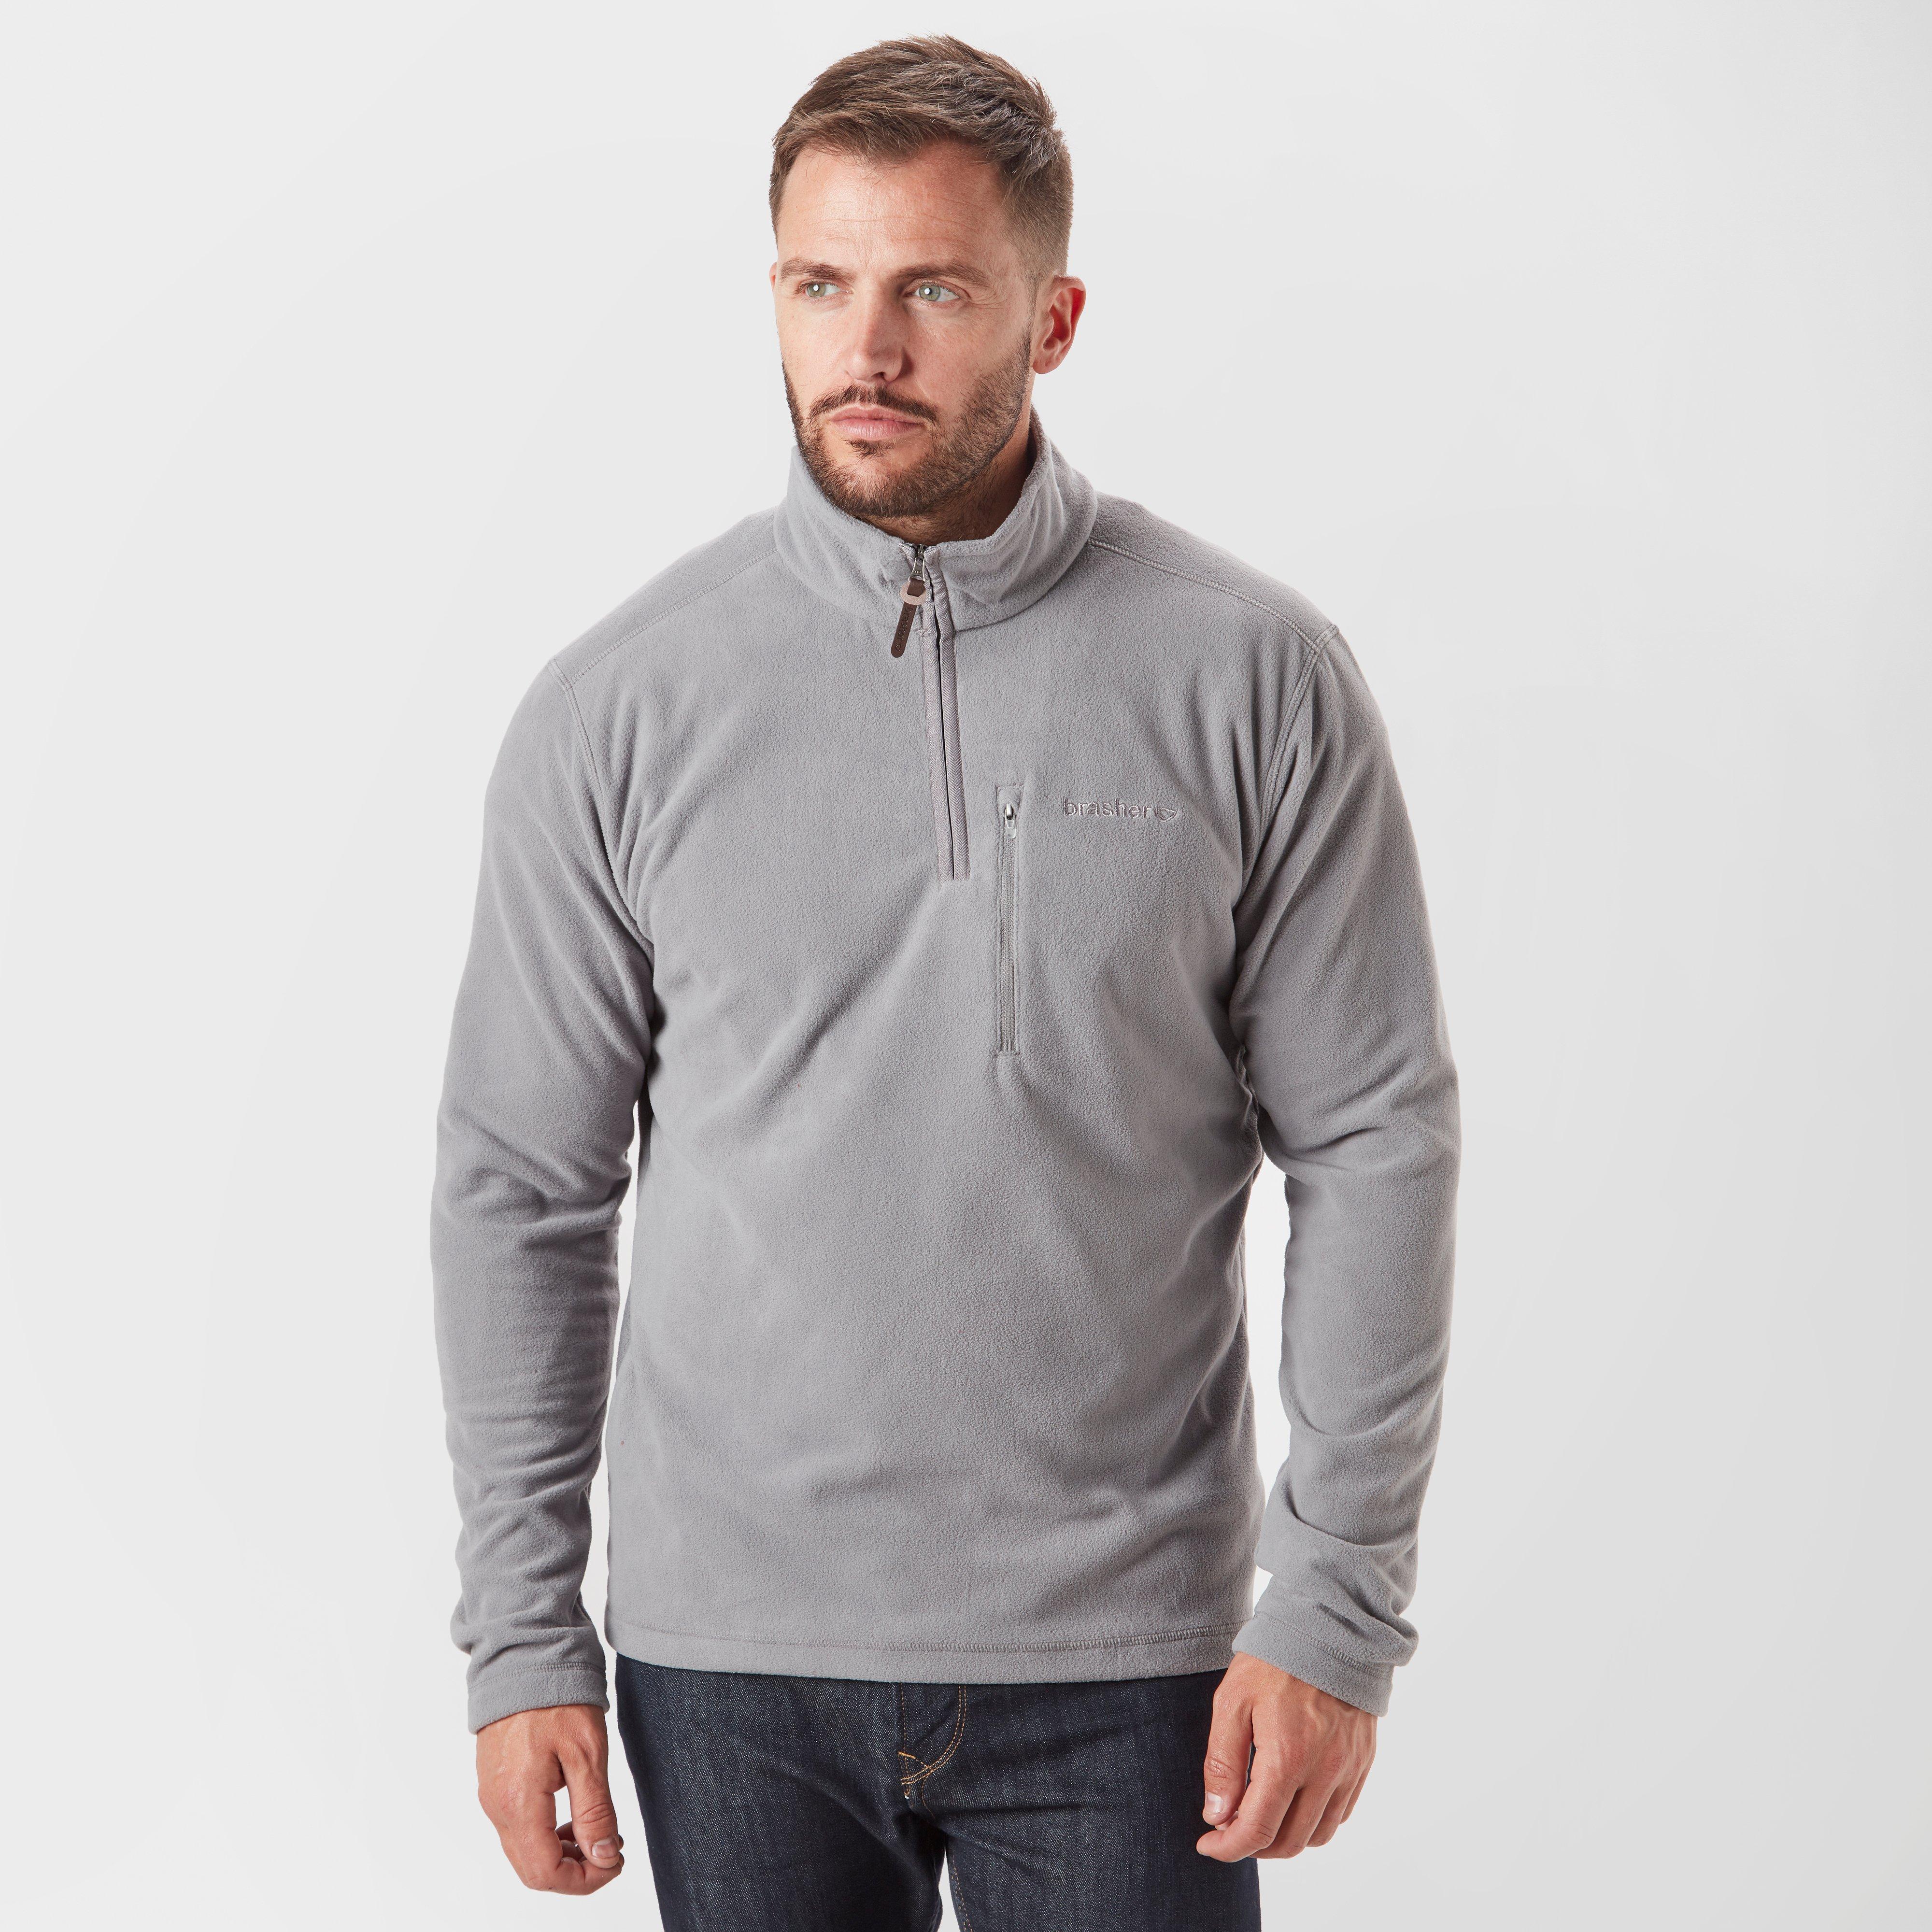 Brasher Brasher Mens Bleaberry II Half Zip Fleece - Grey, Grey